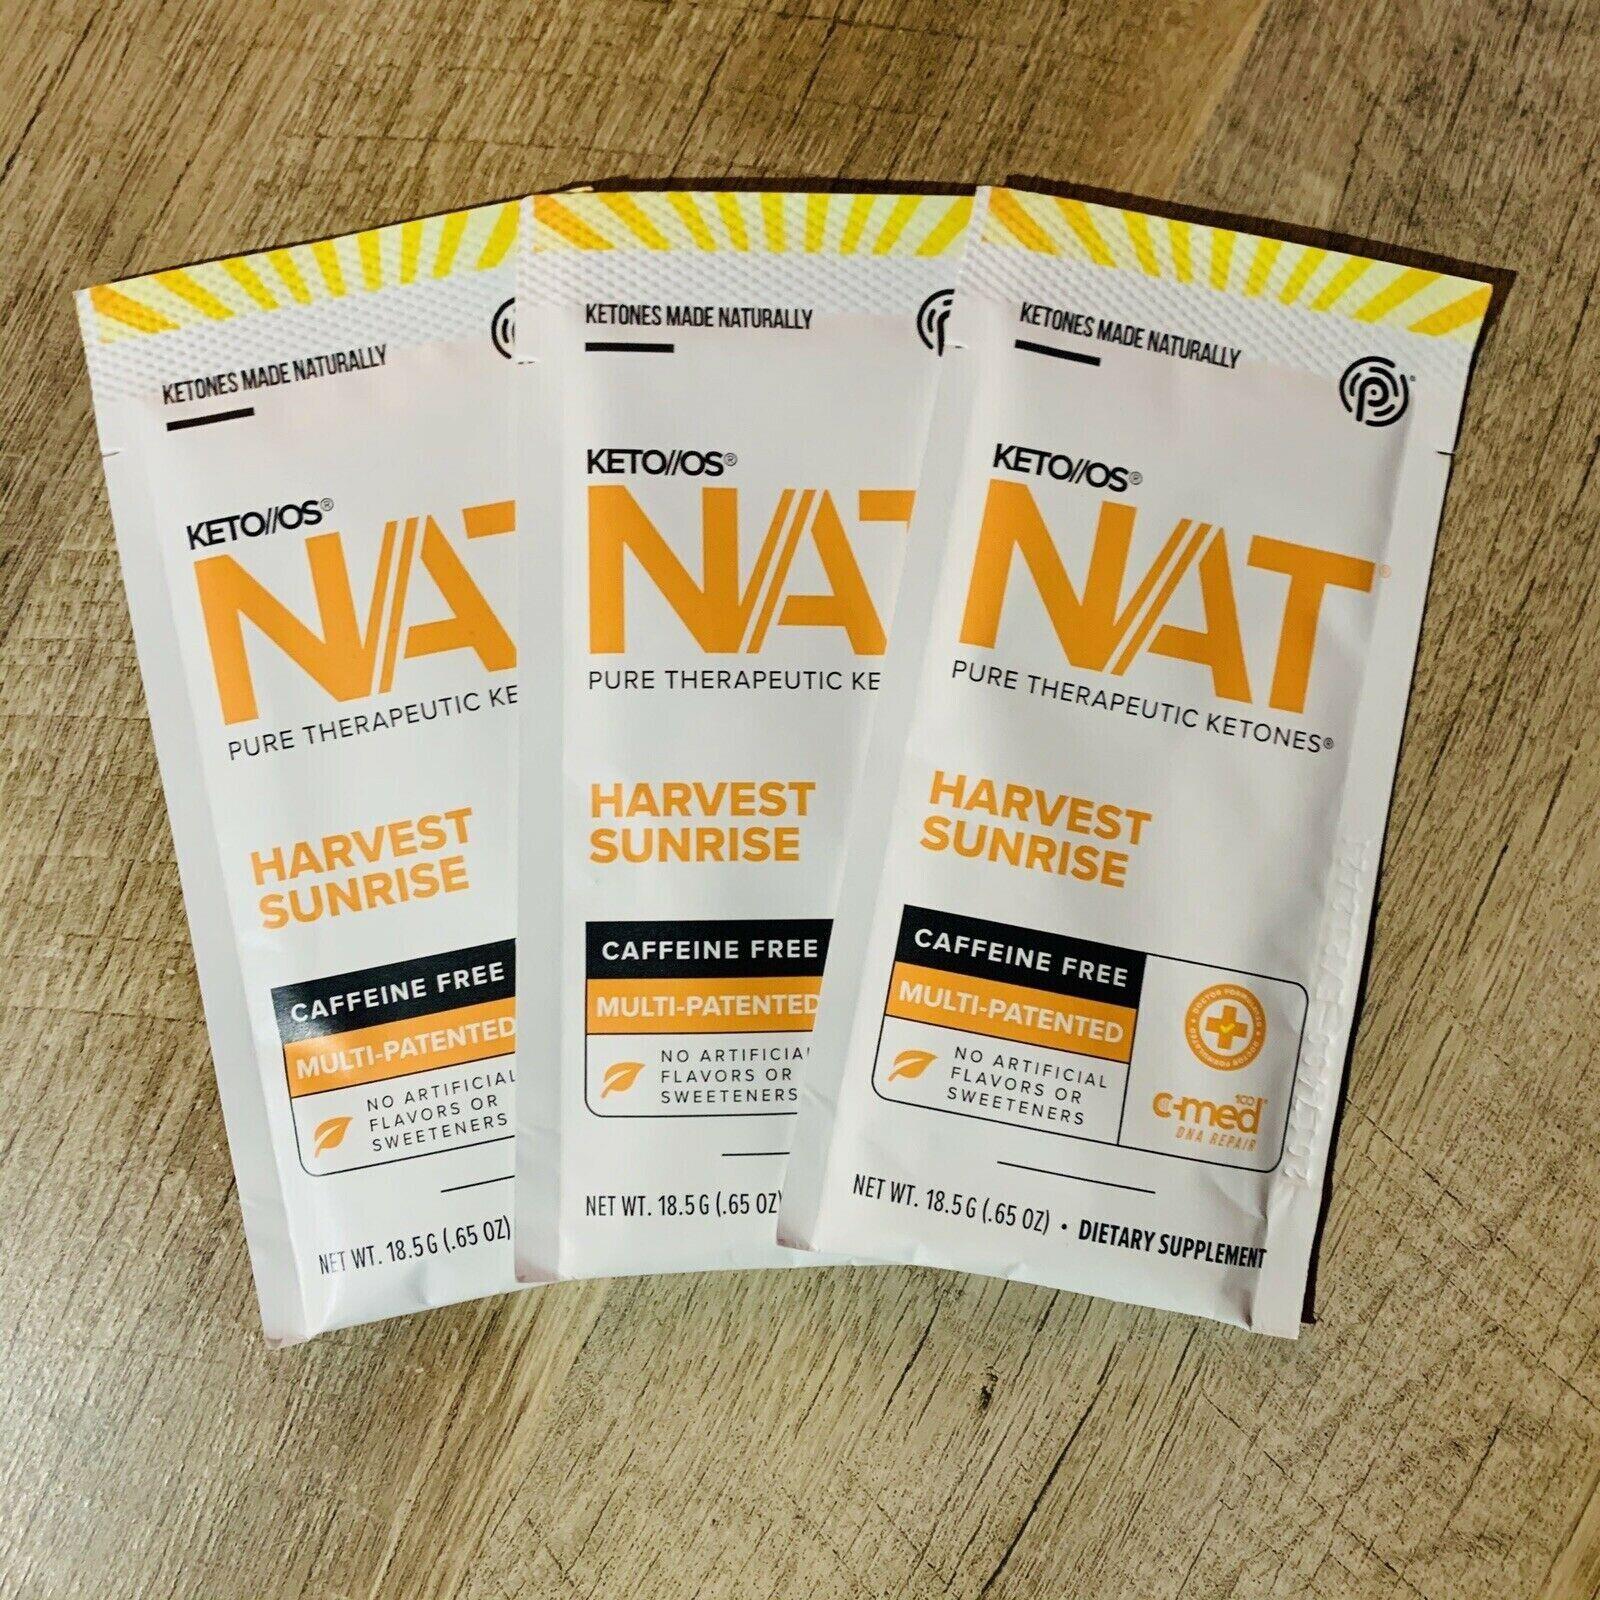 Pruvit Keto OS NAT Ketones Limited Release Harvest Sunrise 3 Pack *Caffeine Free